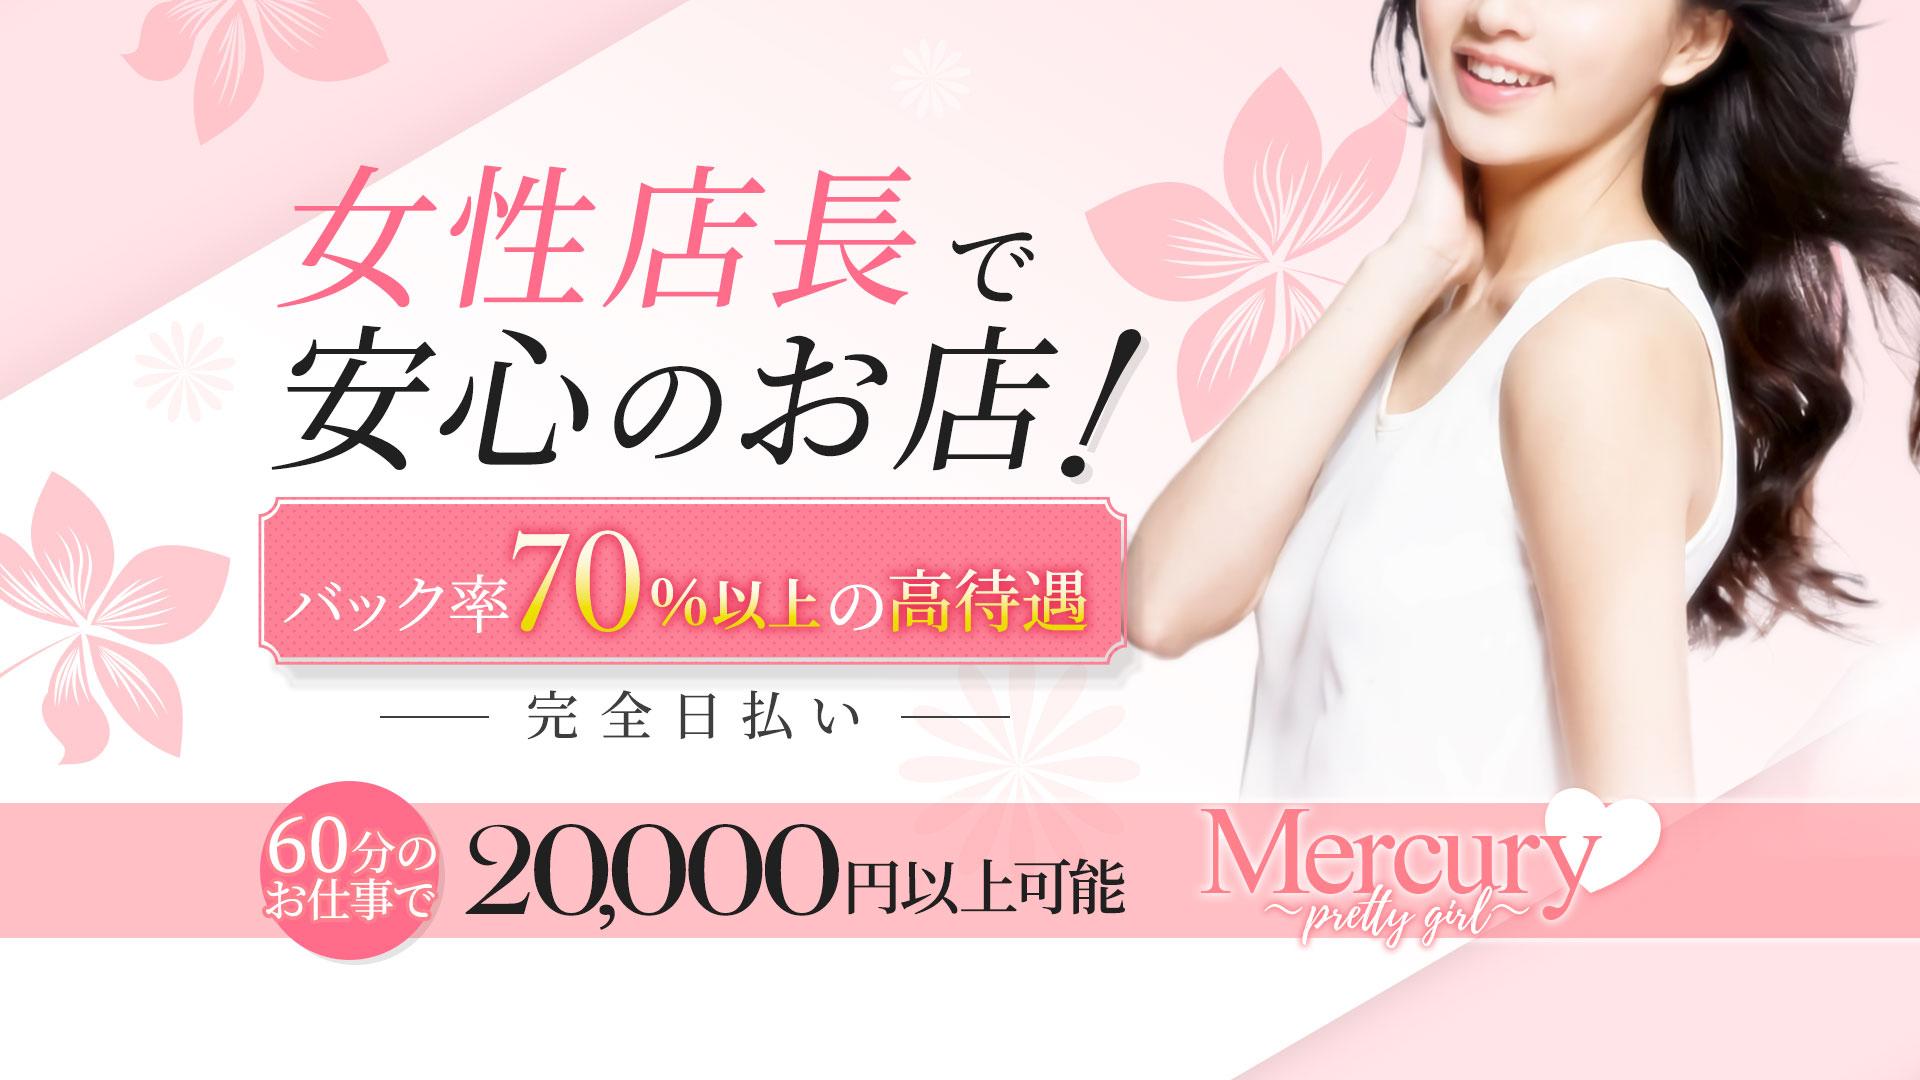 Mercury ~pretty girl~の求人画像